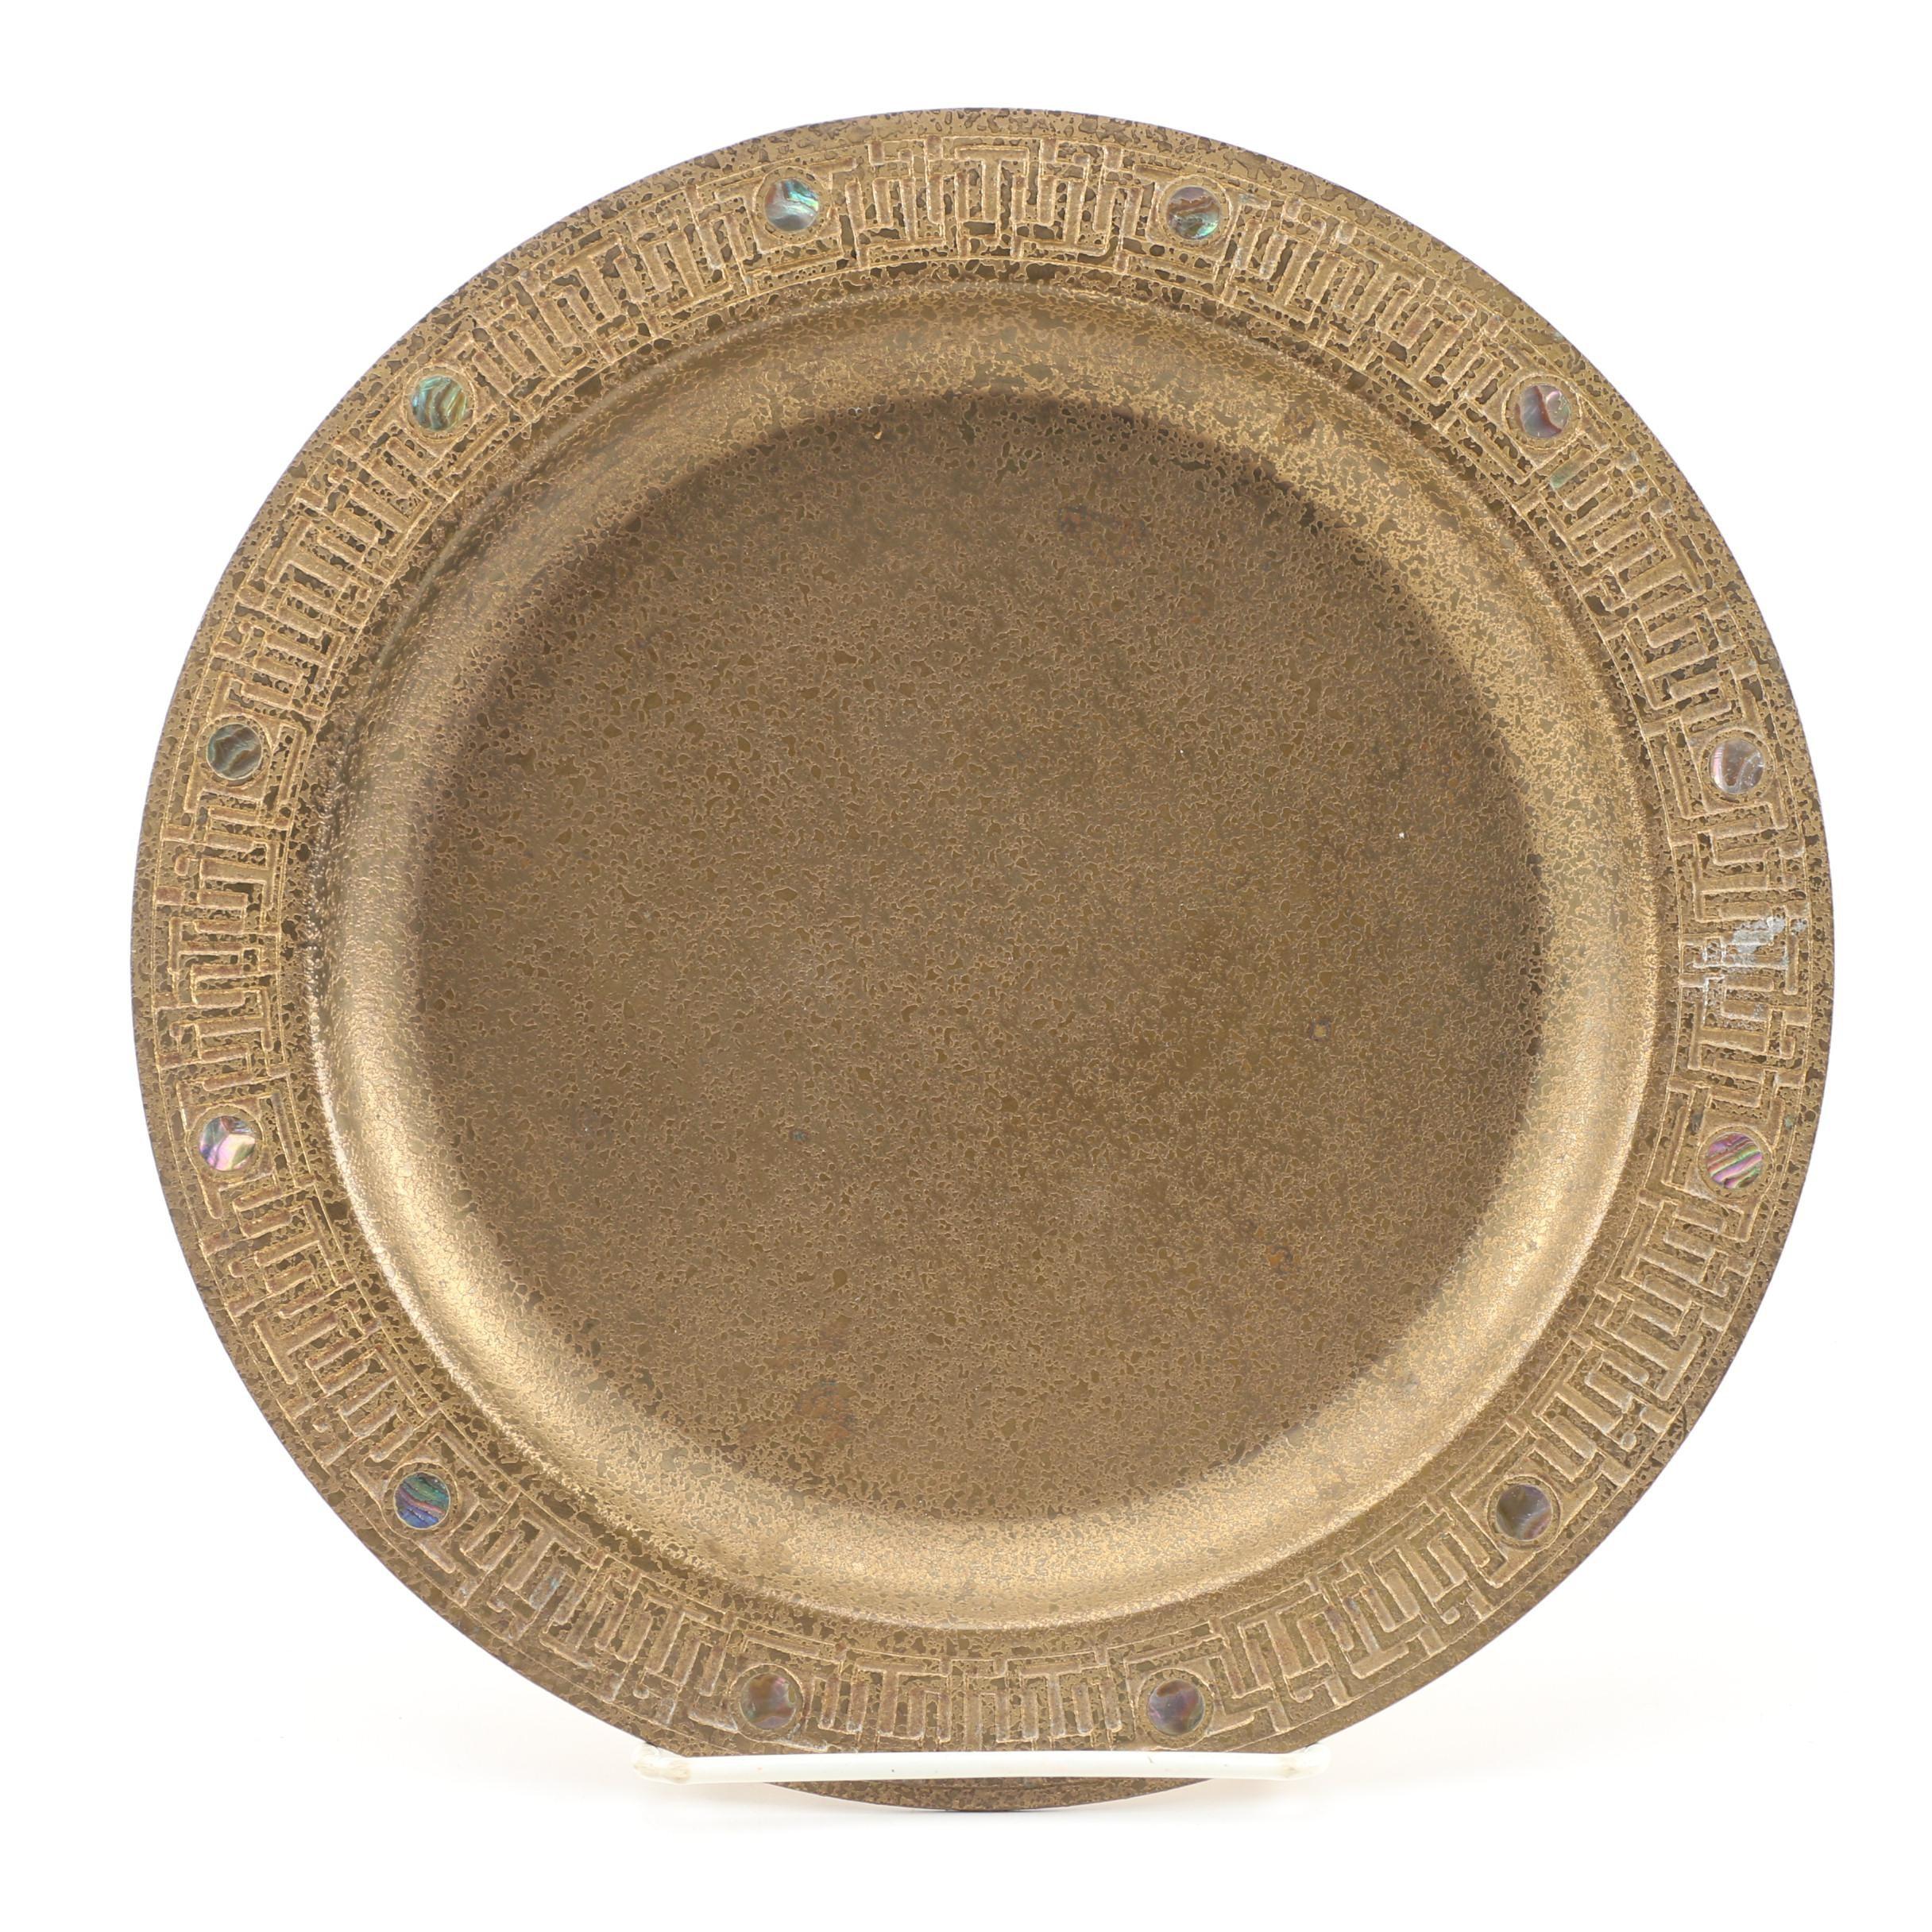 Tiffany Studios Bronze Doré Plate with Abalone Inlay, Circa 1910